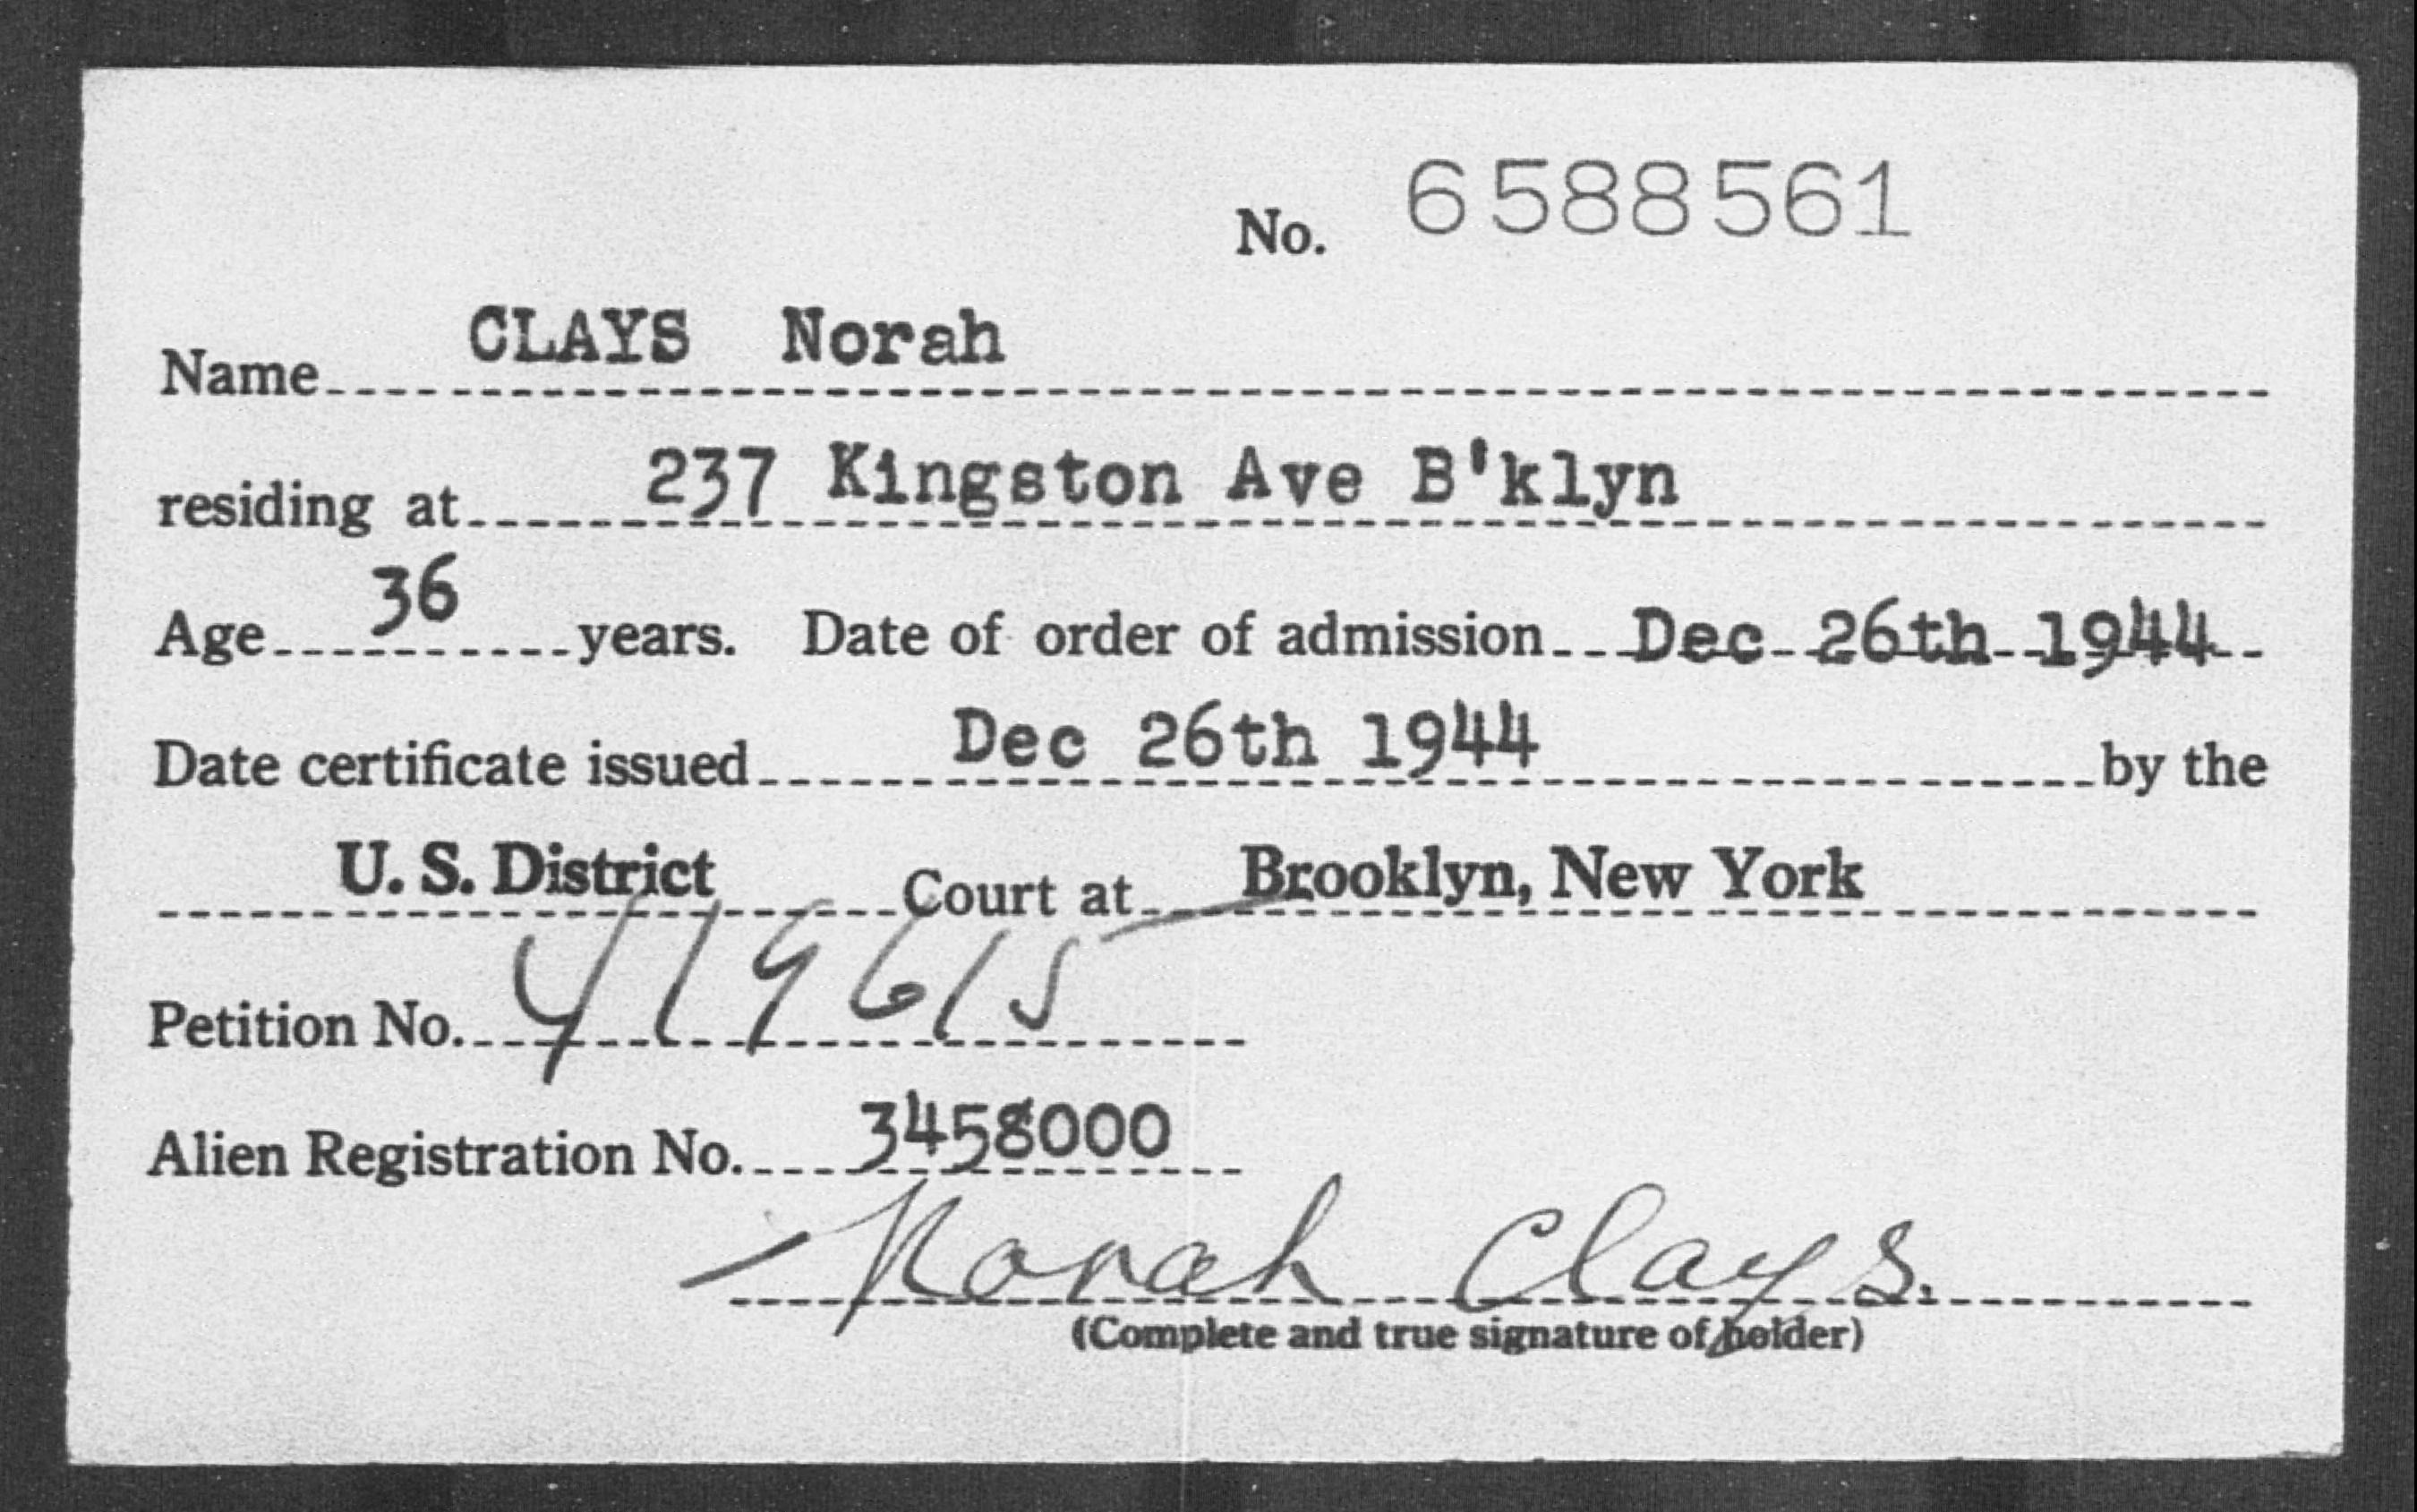 CLAYS Norah - Born: [BLANK], Naturalized: 1944